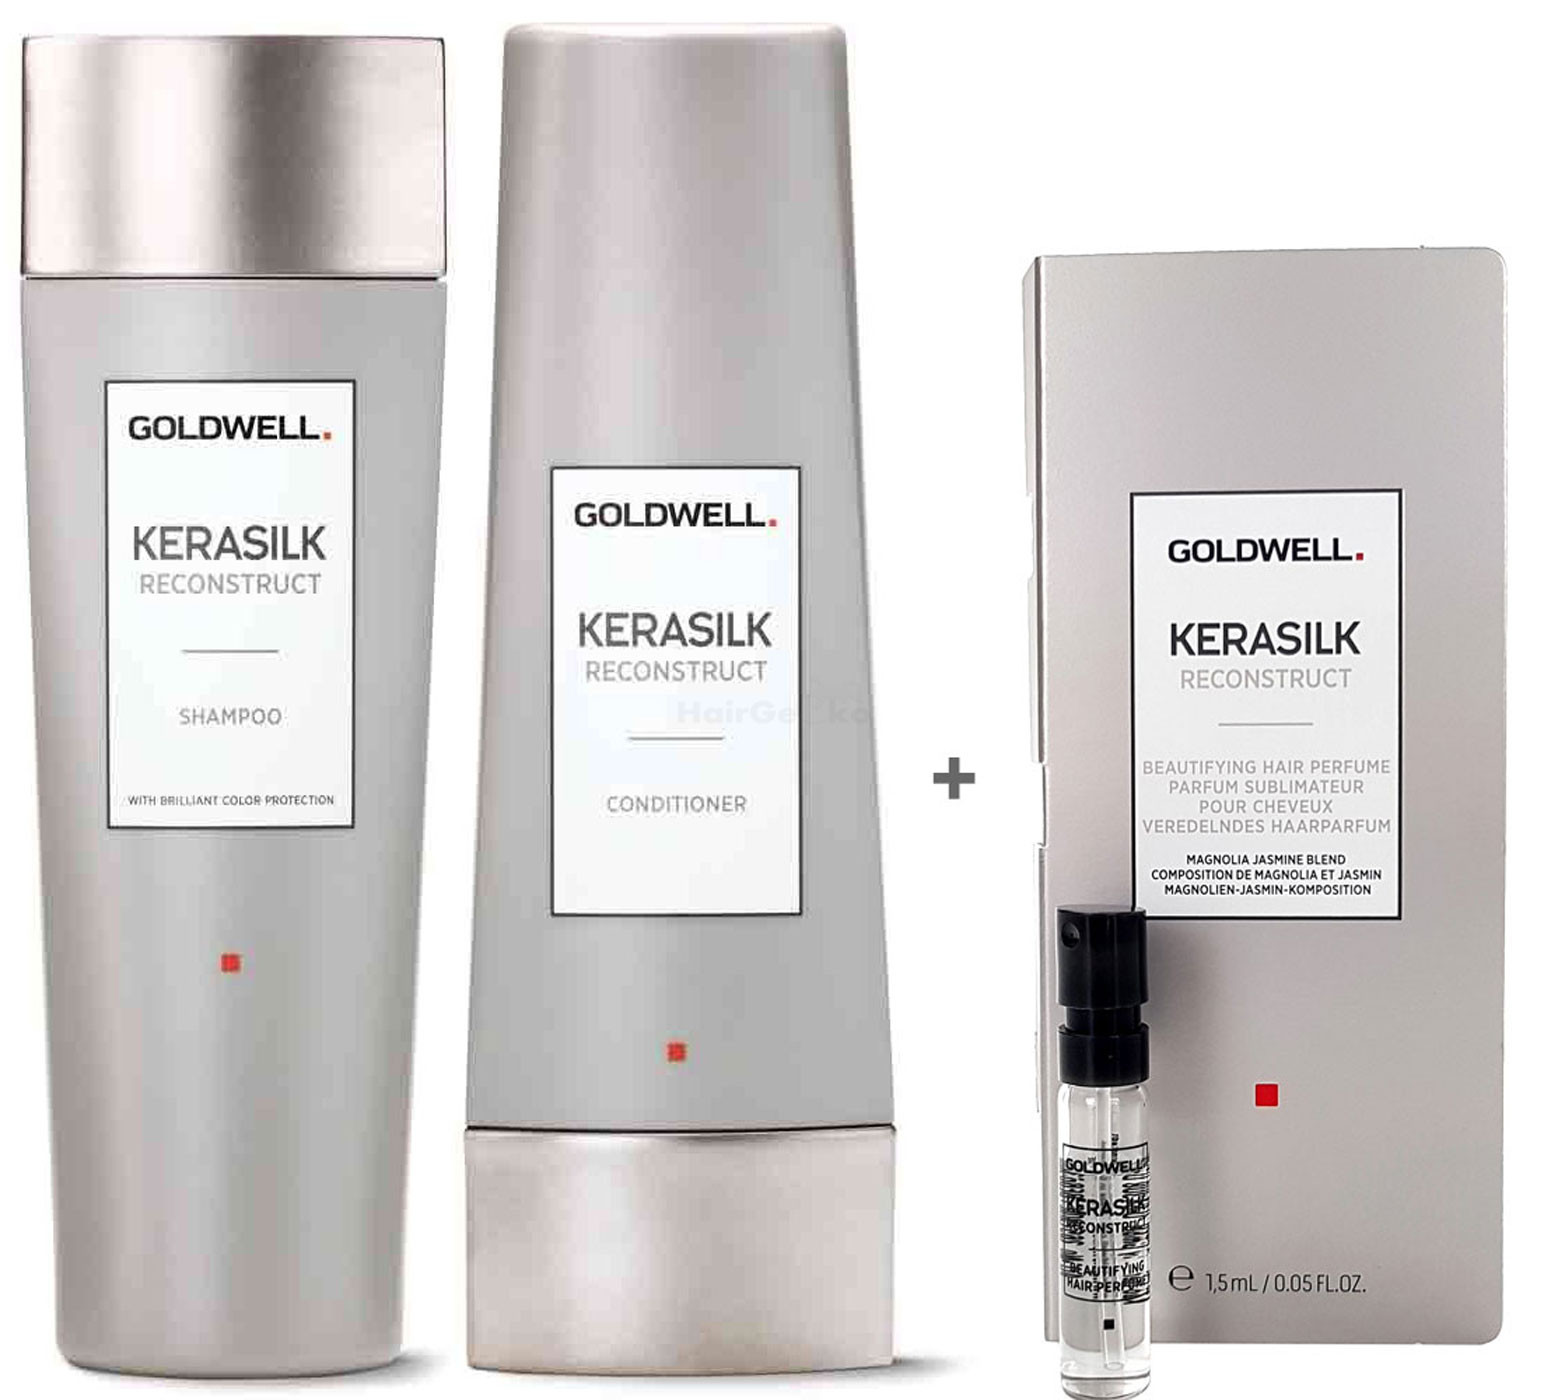 Goldwell Kerasilk Reconstruct Set - Shampoo 250ml + Conditioner 200ml + Haarparfum Probe 1,5ml